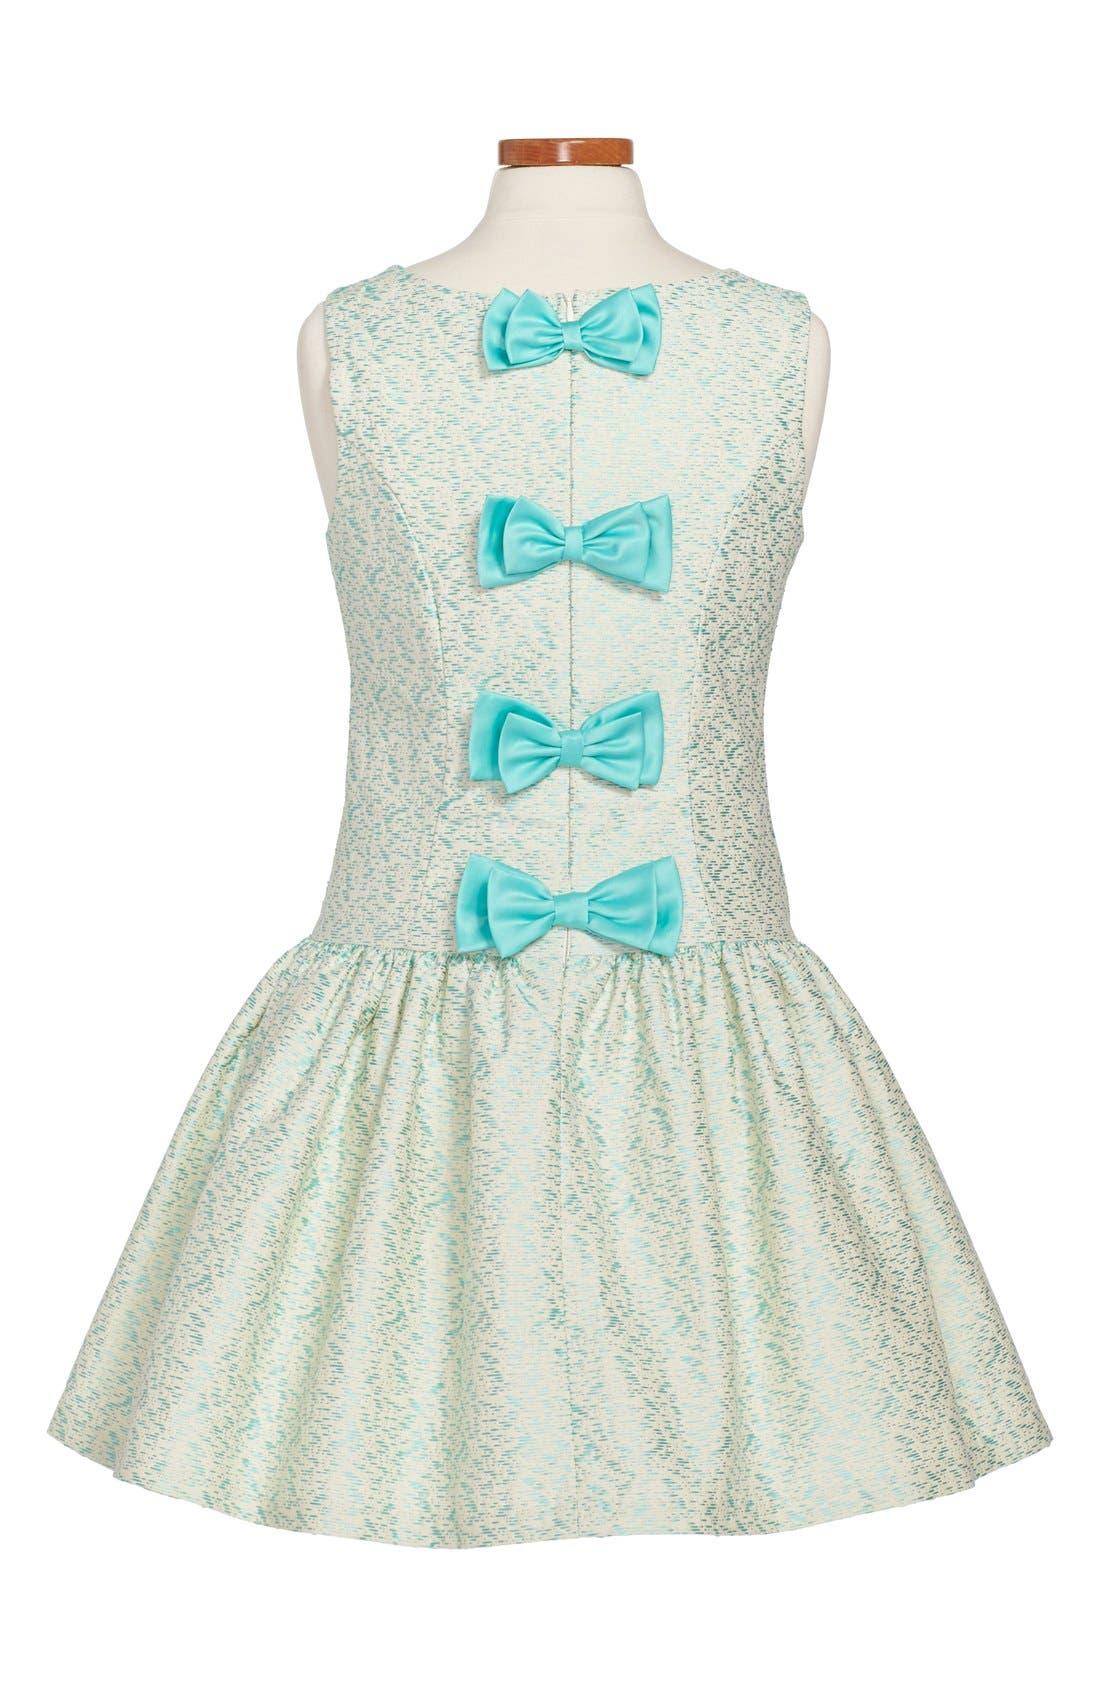 Alternate Image 2  - Iris & Ivy Sleeveless Brocade Dress (Big Girls)